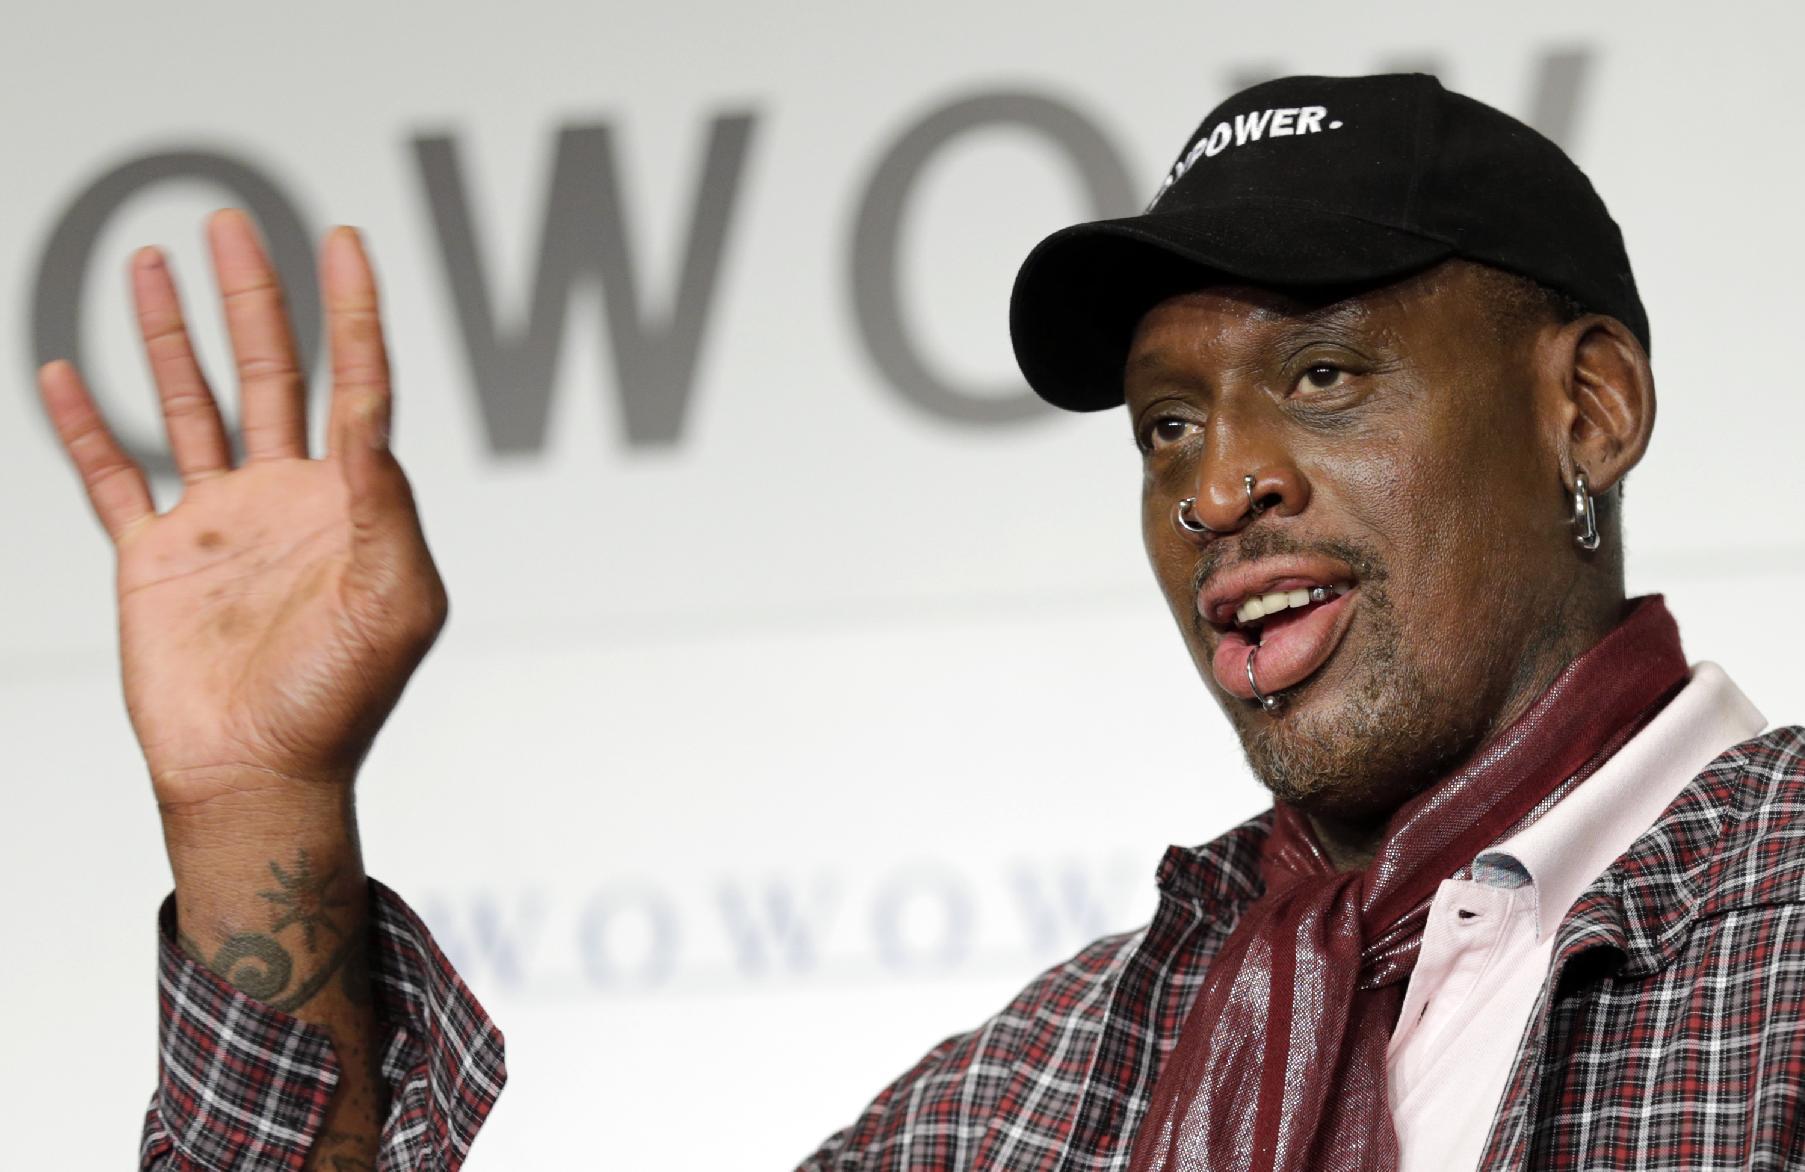 APNewsbreak: Rodman names team for exhibition